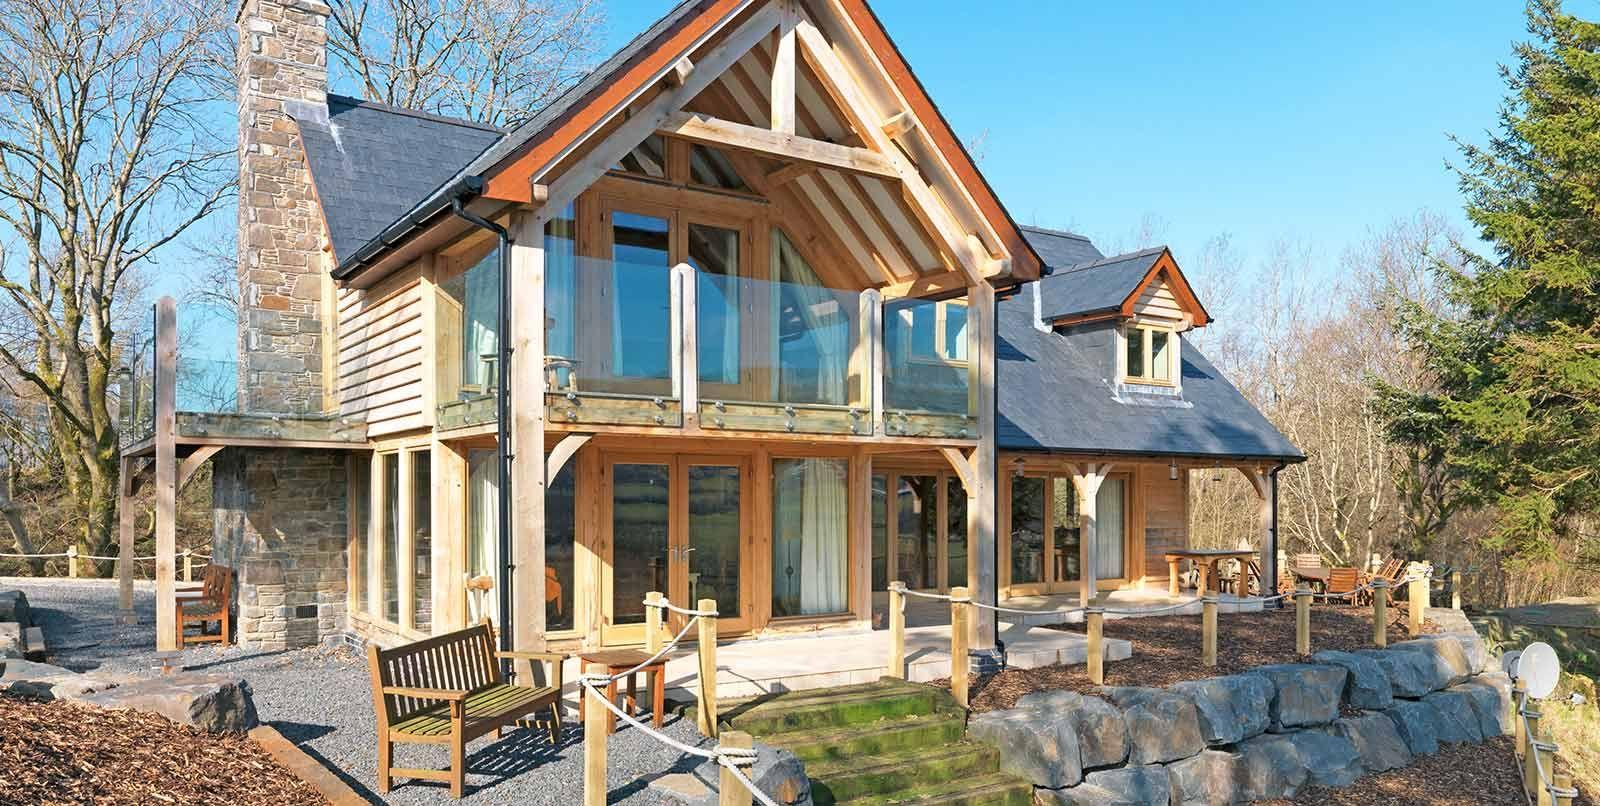 Bespoke oak frame homes | Mansions | Pinterest | Bespoke, House and ...